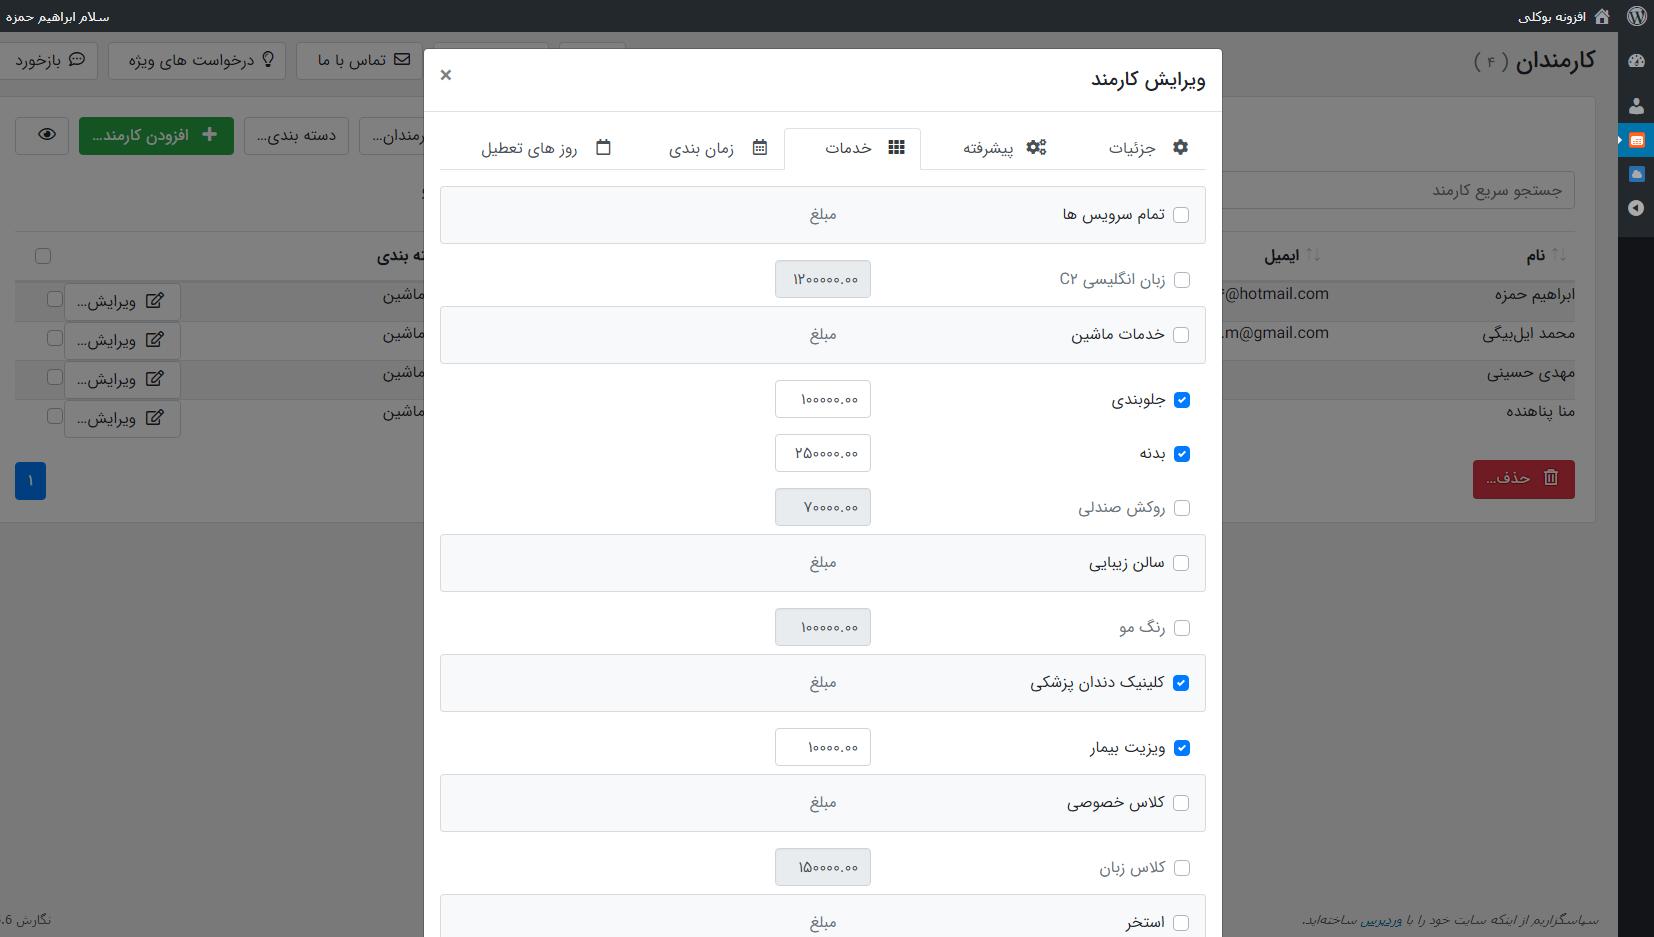 bookly تعیین قیمت هر سرویس با توجه به کارمند